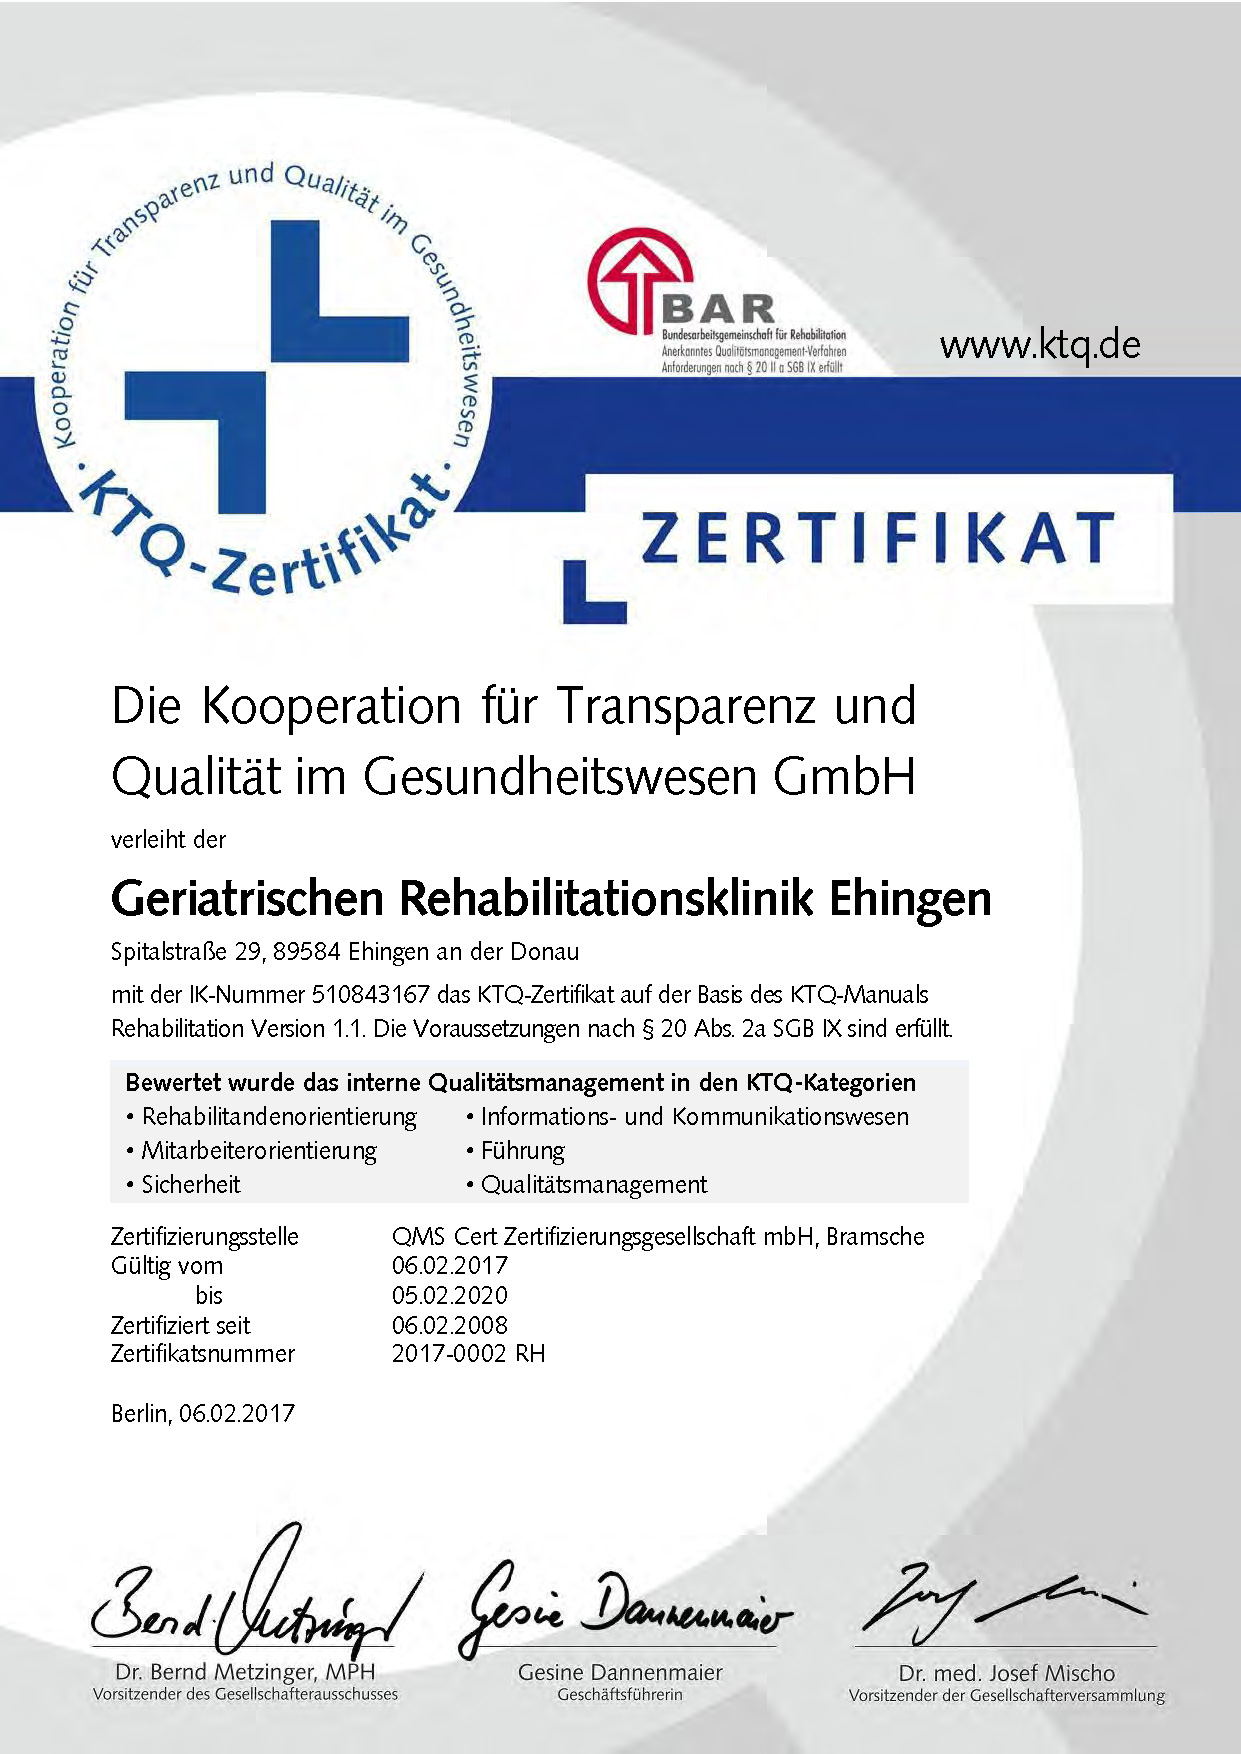 Zertifizierung Geriatrische Rehabilitationsklinik Ehingen